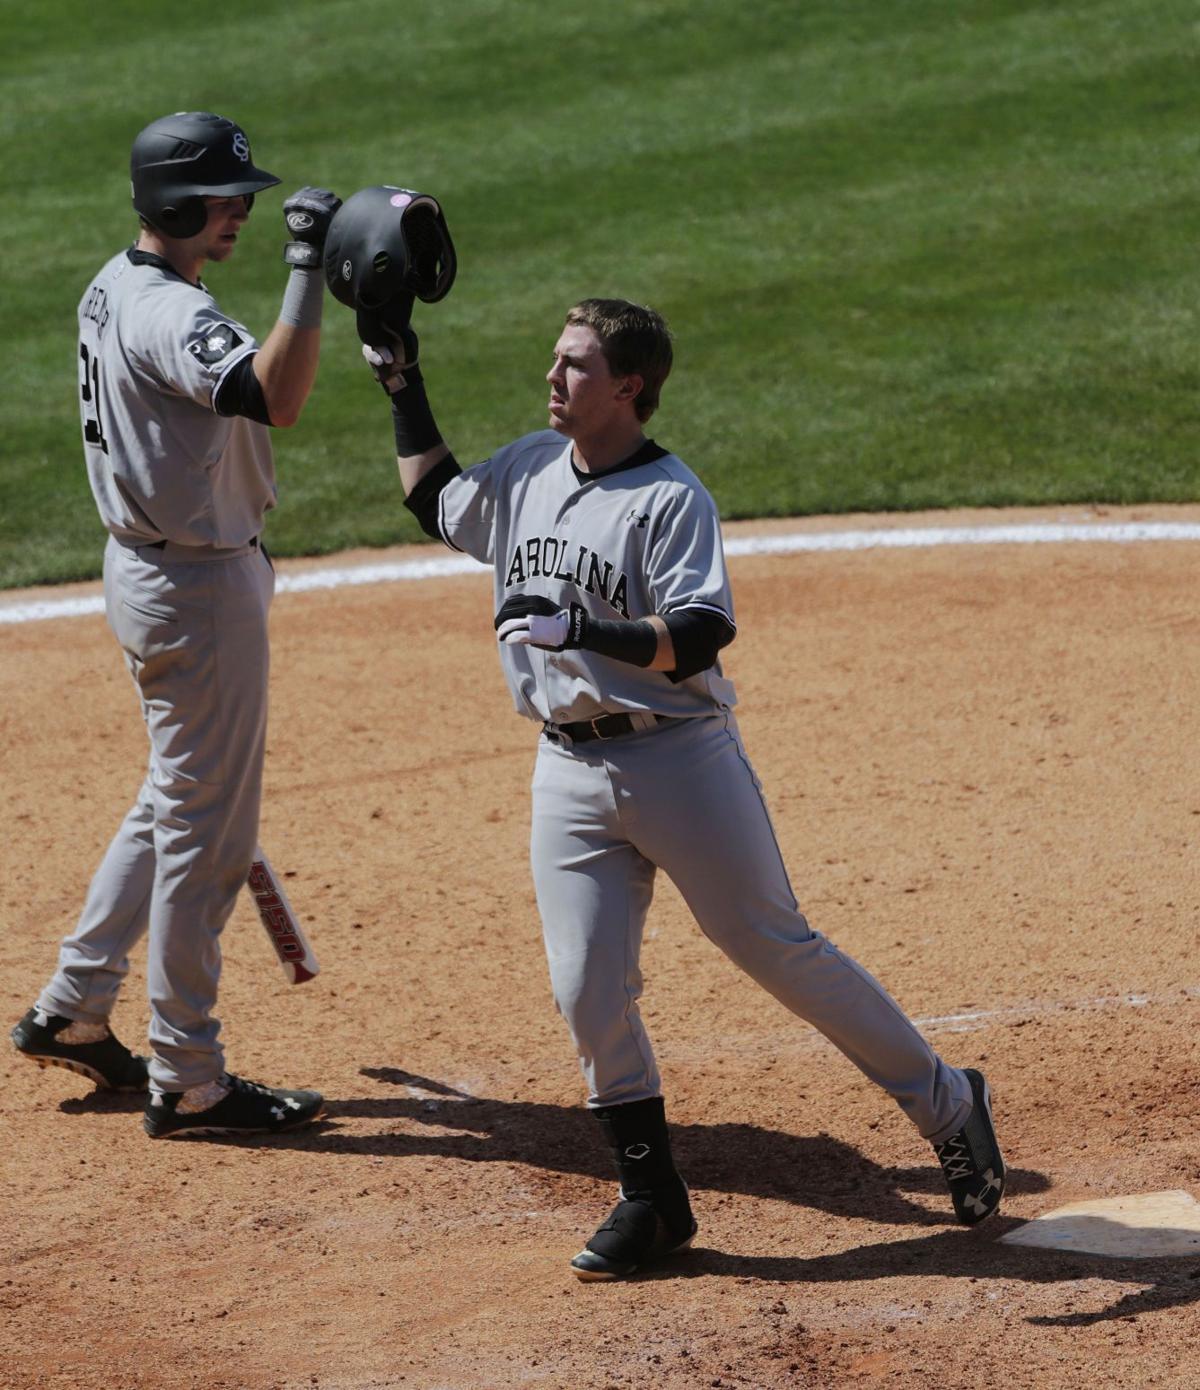 Dantzler blooms as power hitter at South Carolina